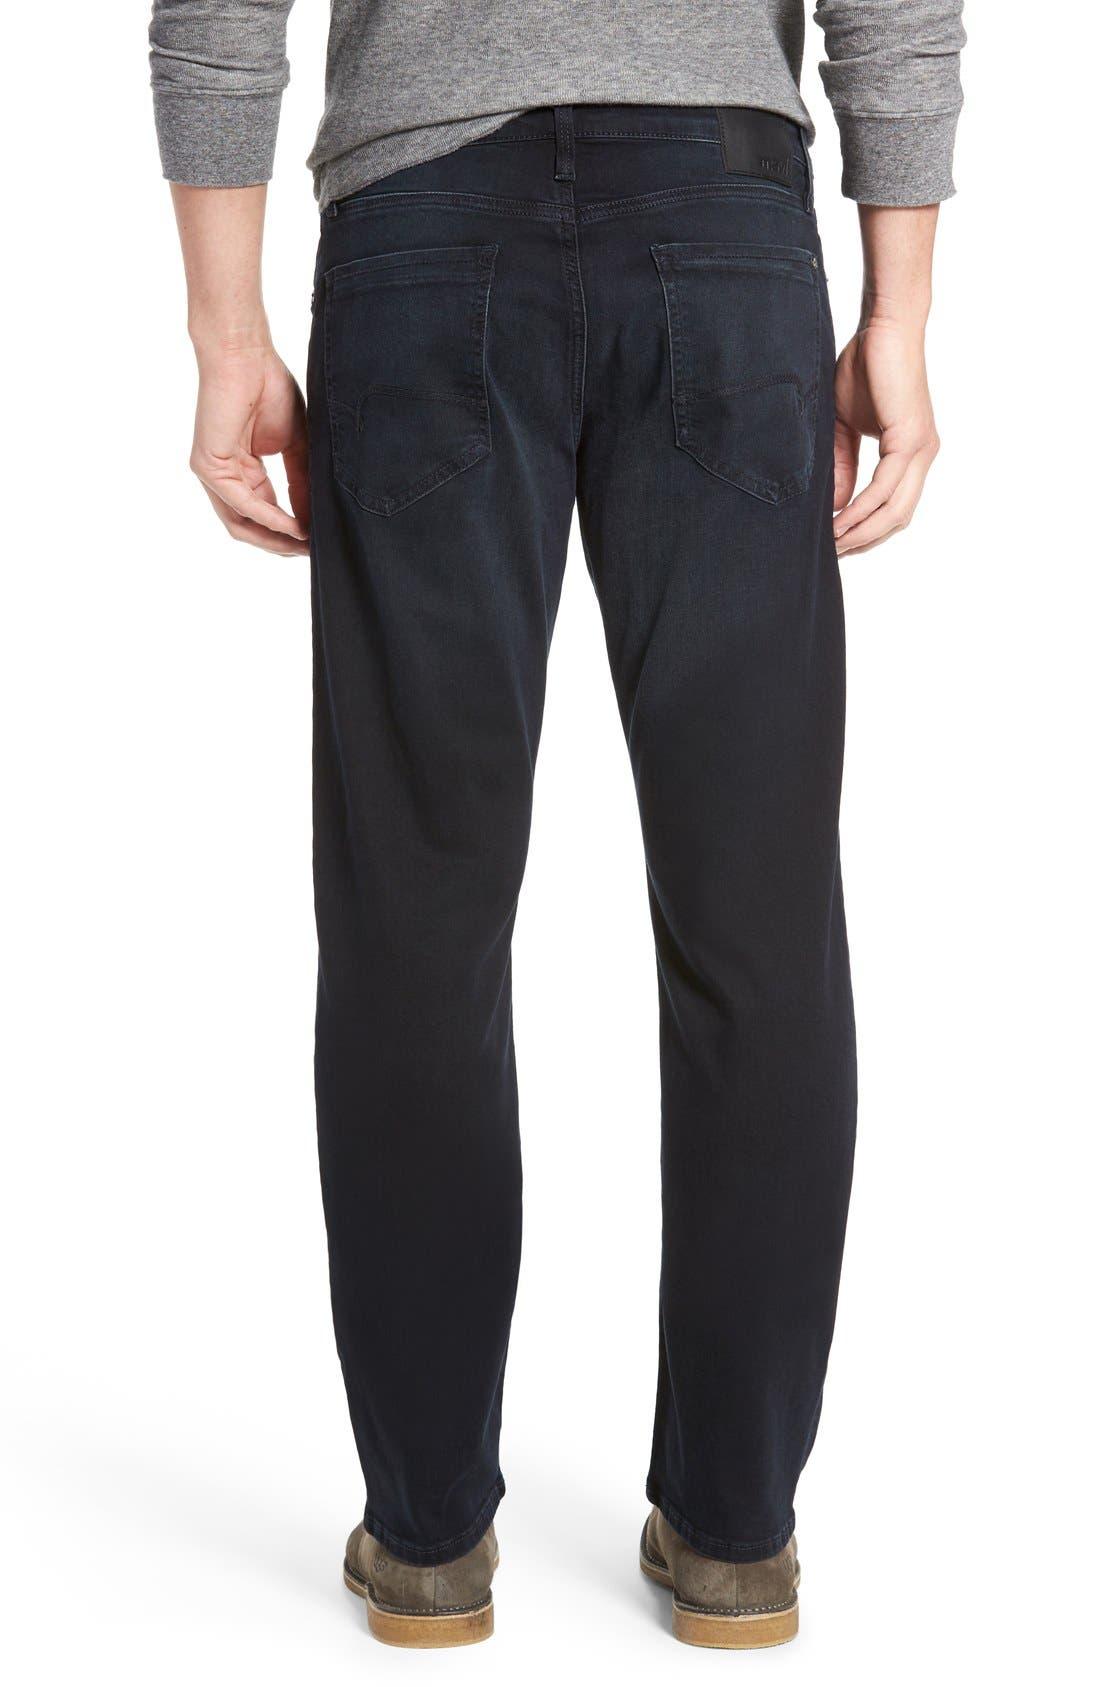 'Myles' Straight Leg Jeans,                             Alternate thumbnail 2, color,                             Ink Brushed Williamsburg